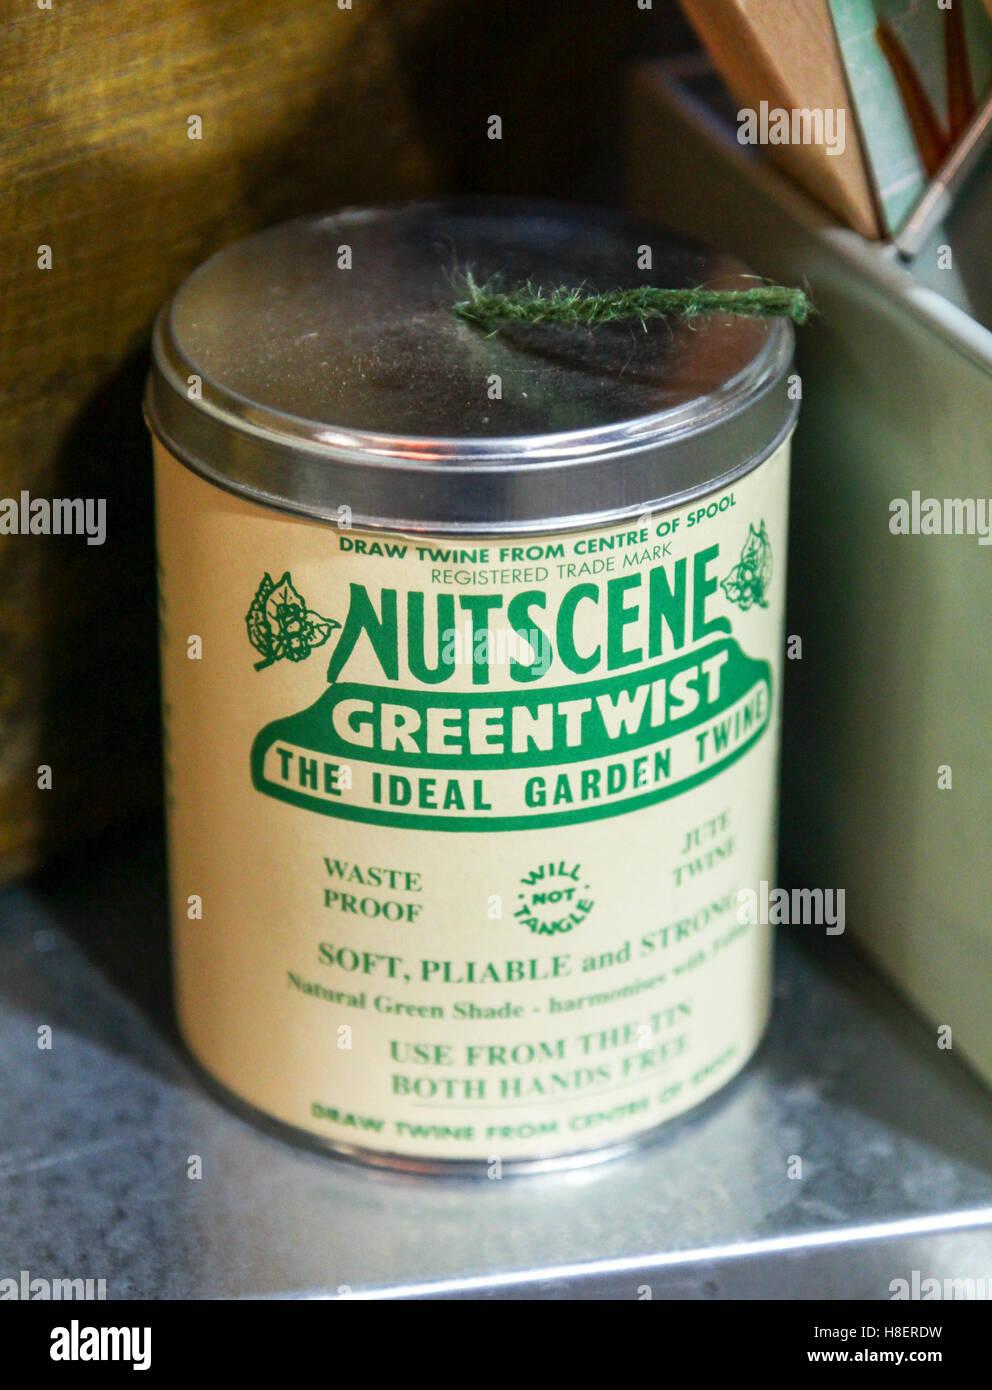 Une boîte de 'Nutscene' twist vert ficelle de jardin Photo Stock